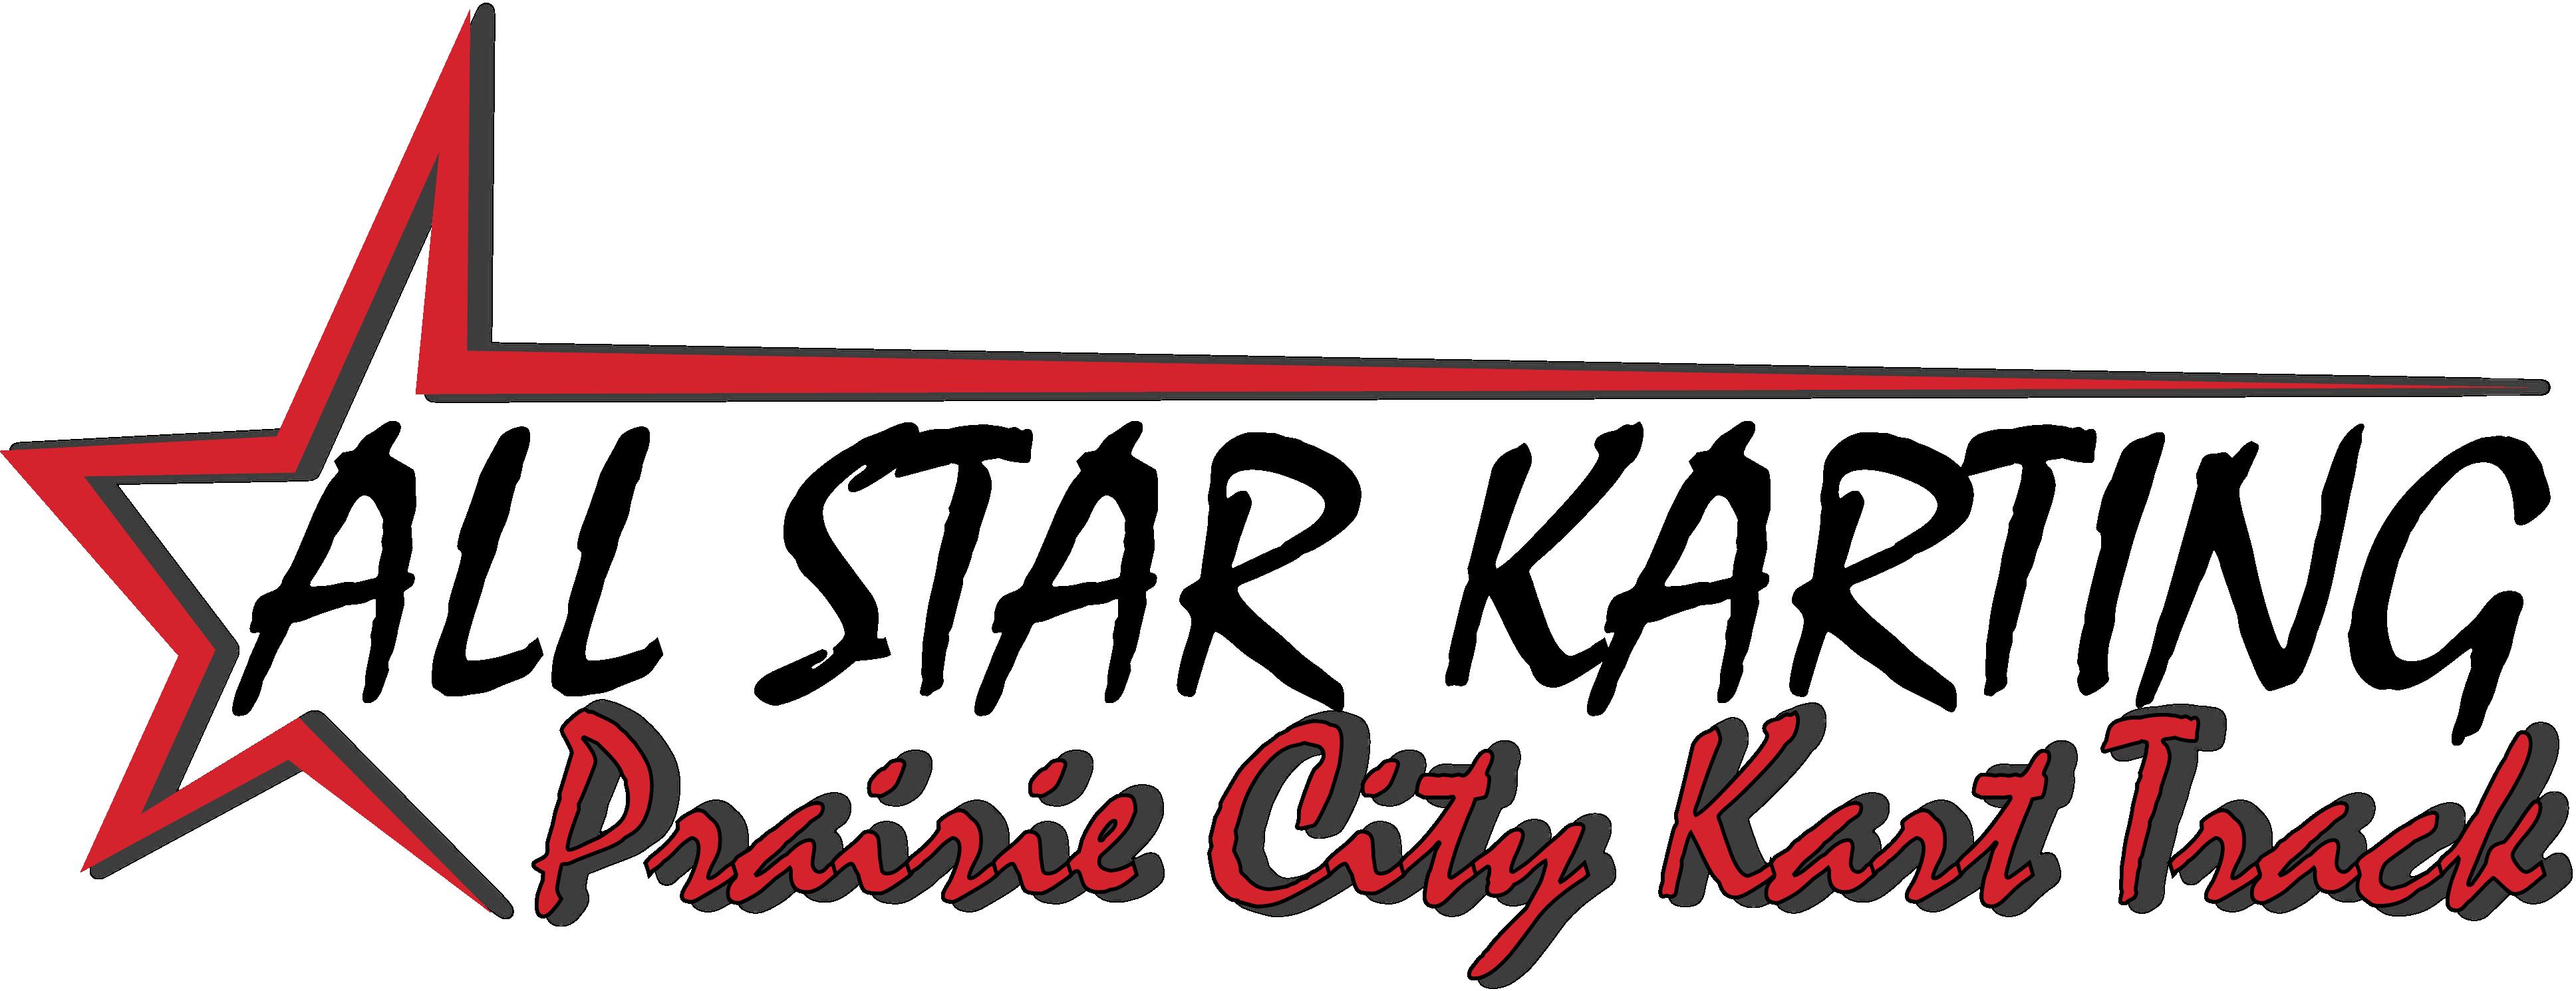 Prairie City Kart Track